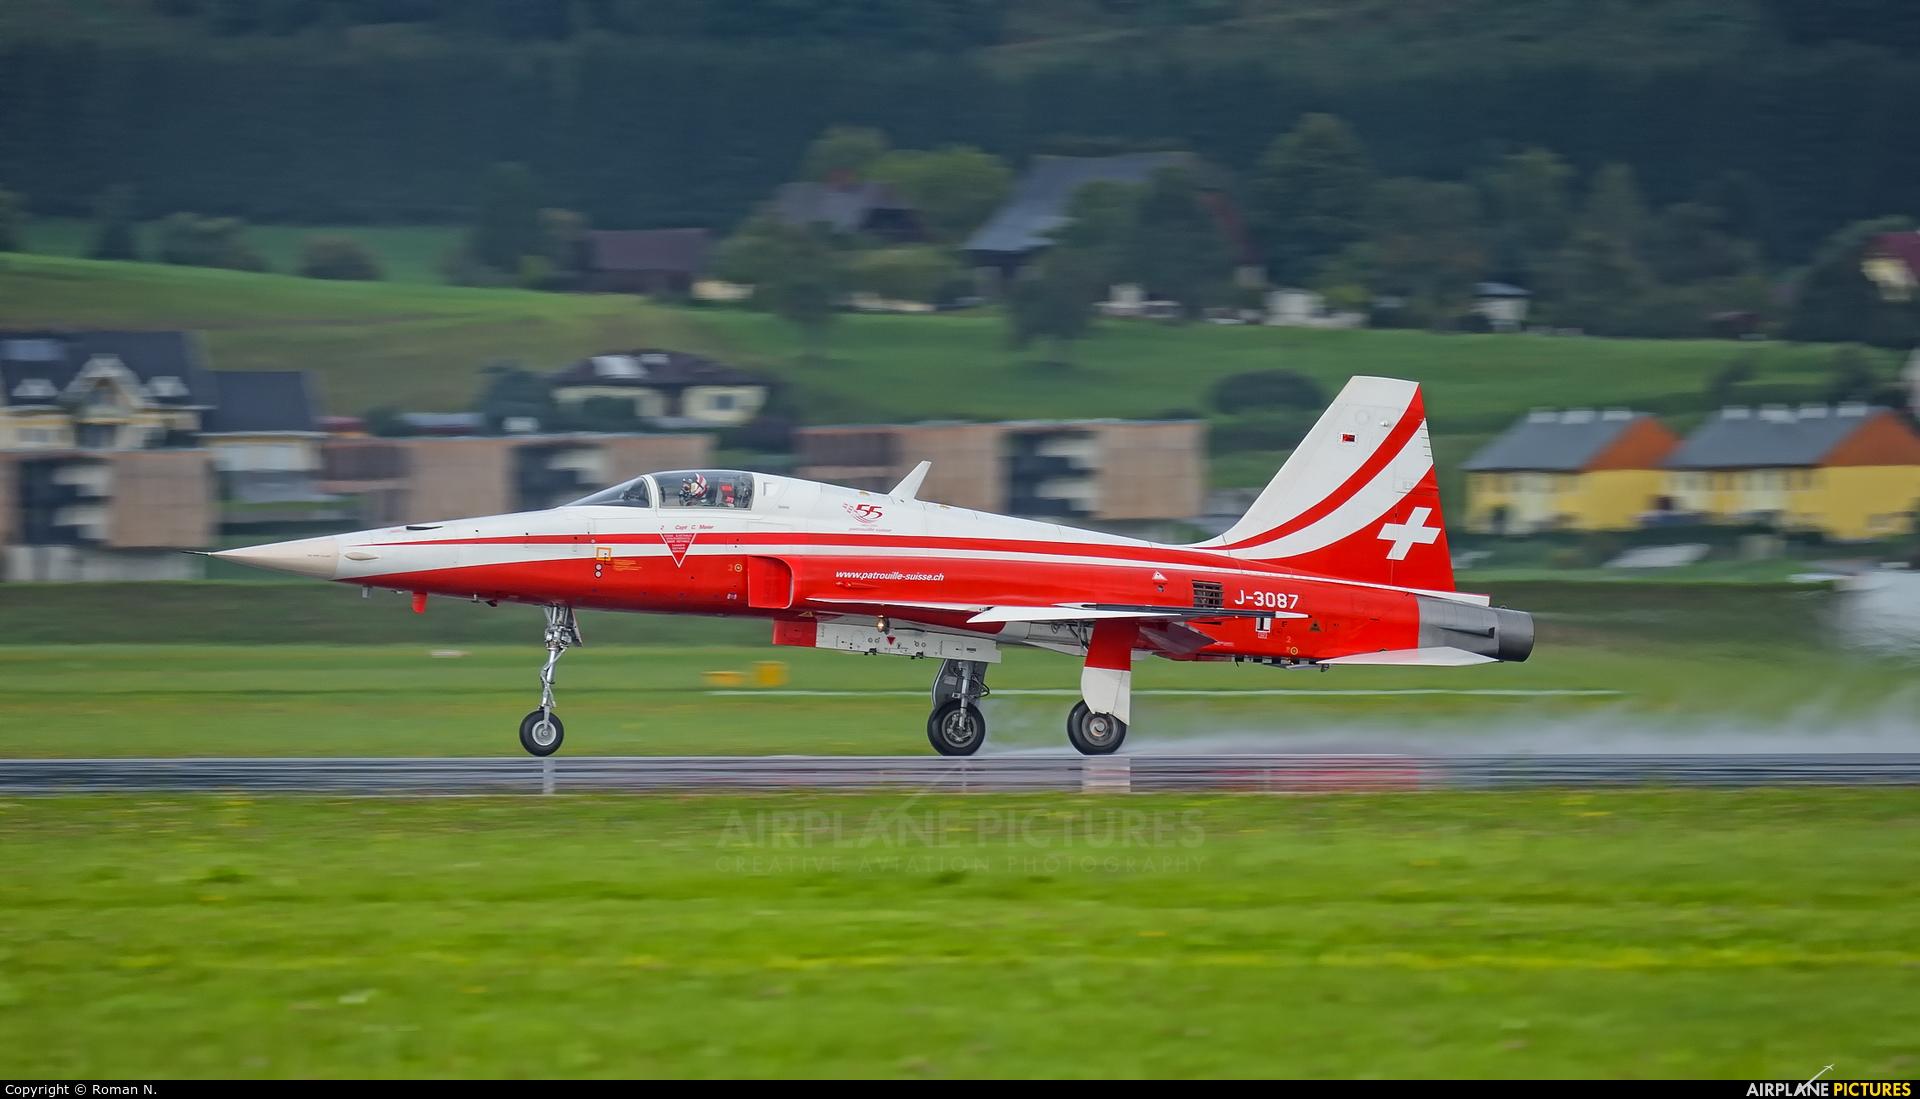 Switzerland - Air Force: Patrouille Suisse J-3087 aircraft at Zeltweg